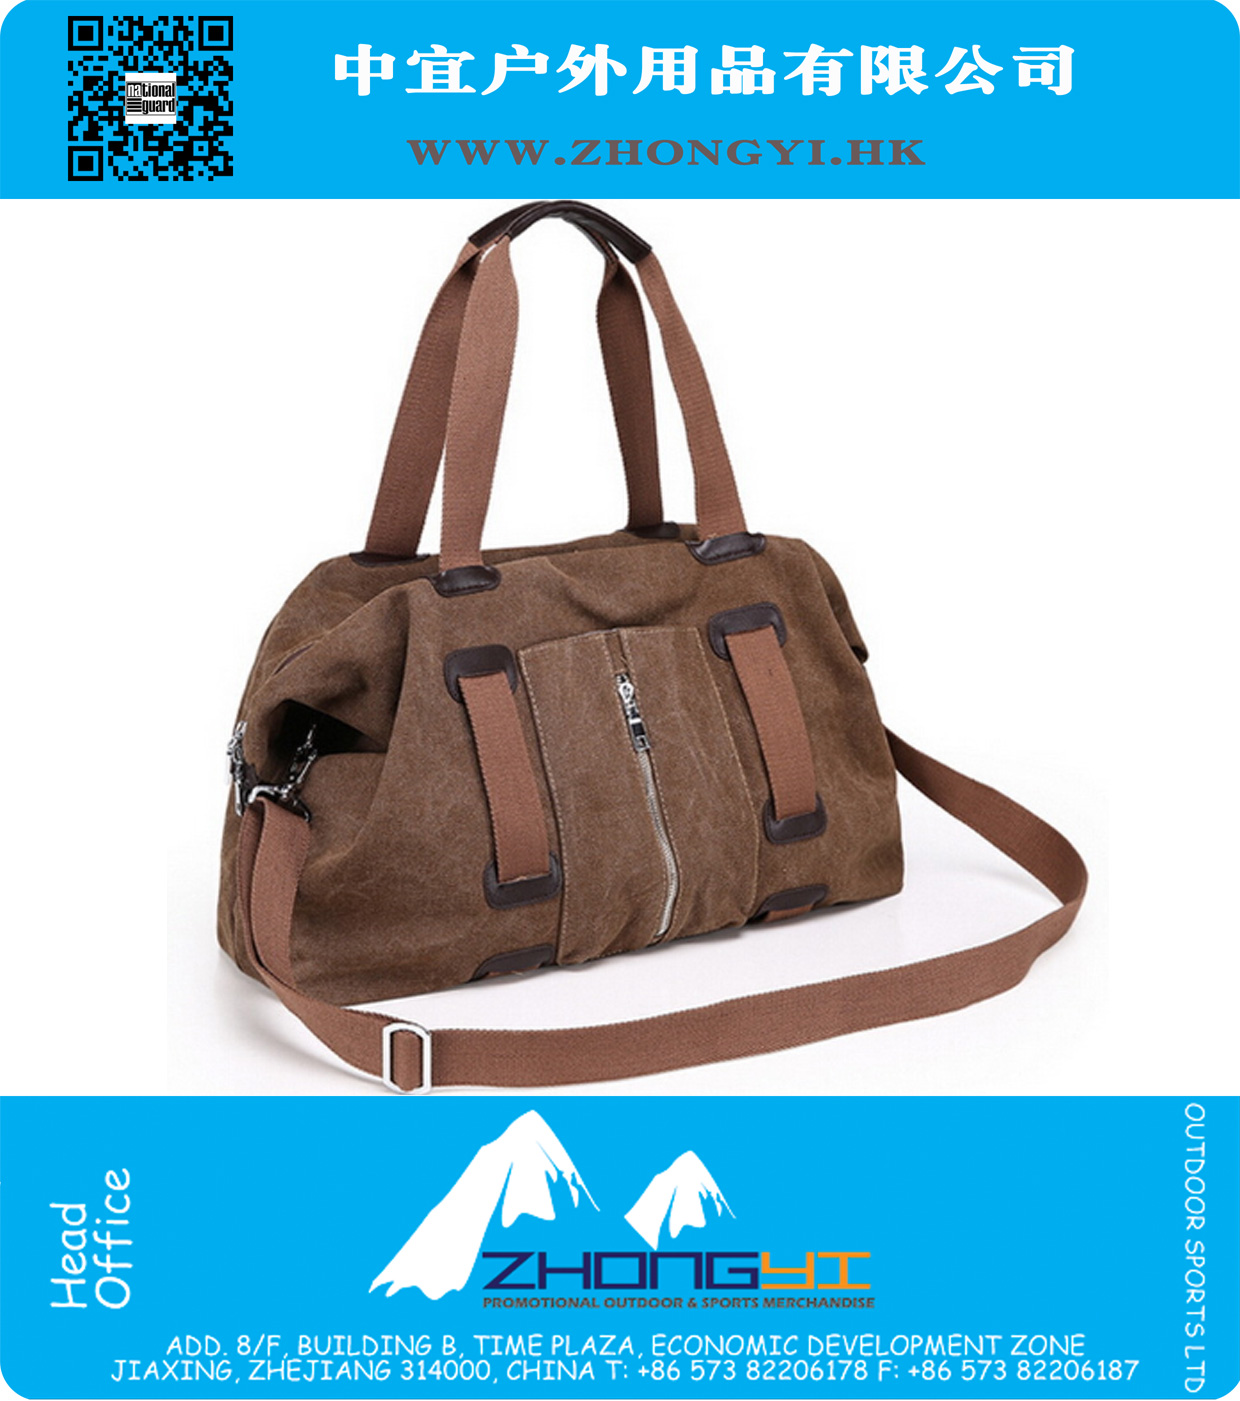 New Style Fashion Sports Travel Bag Large Capacity Bag Men Canvas Bag Men  Travel Handbags Messenger ... a11583f14c9ac